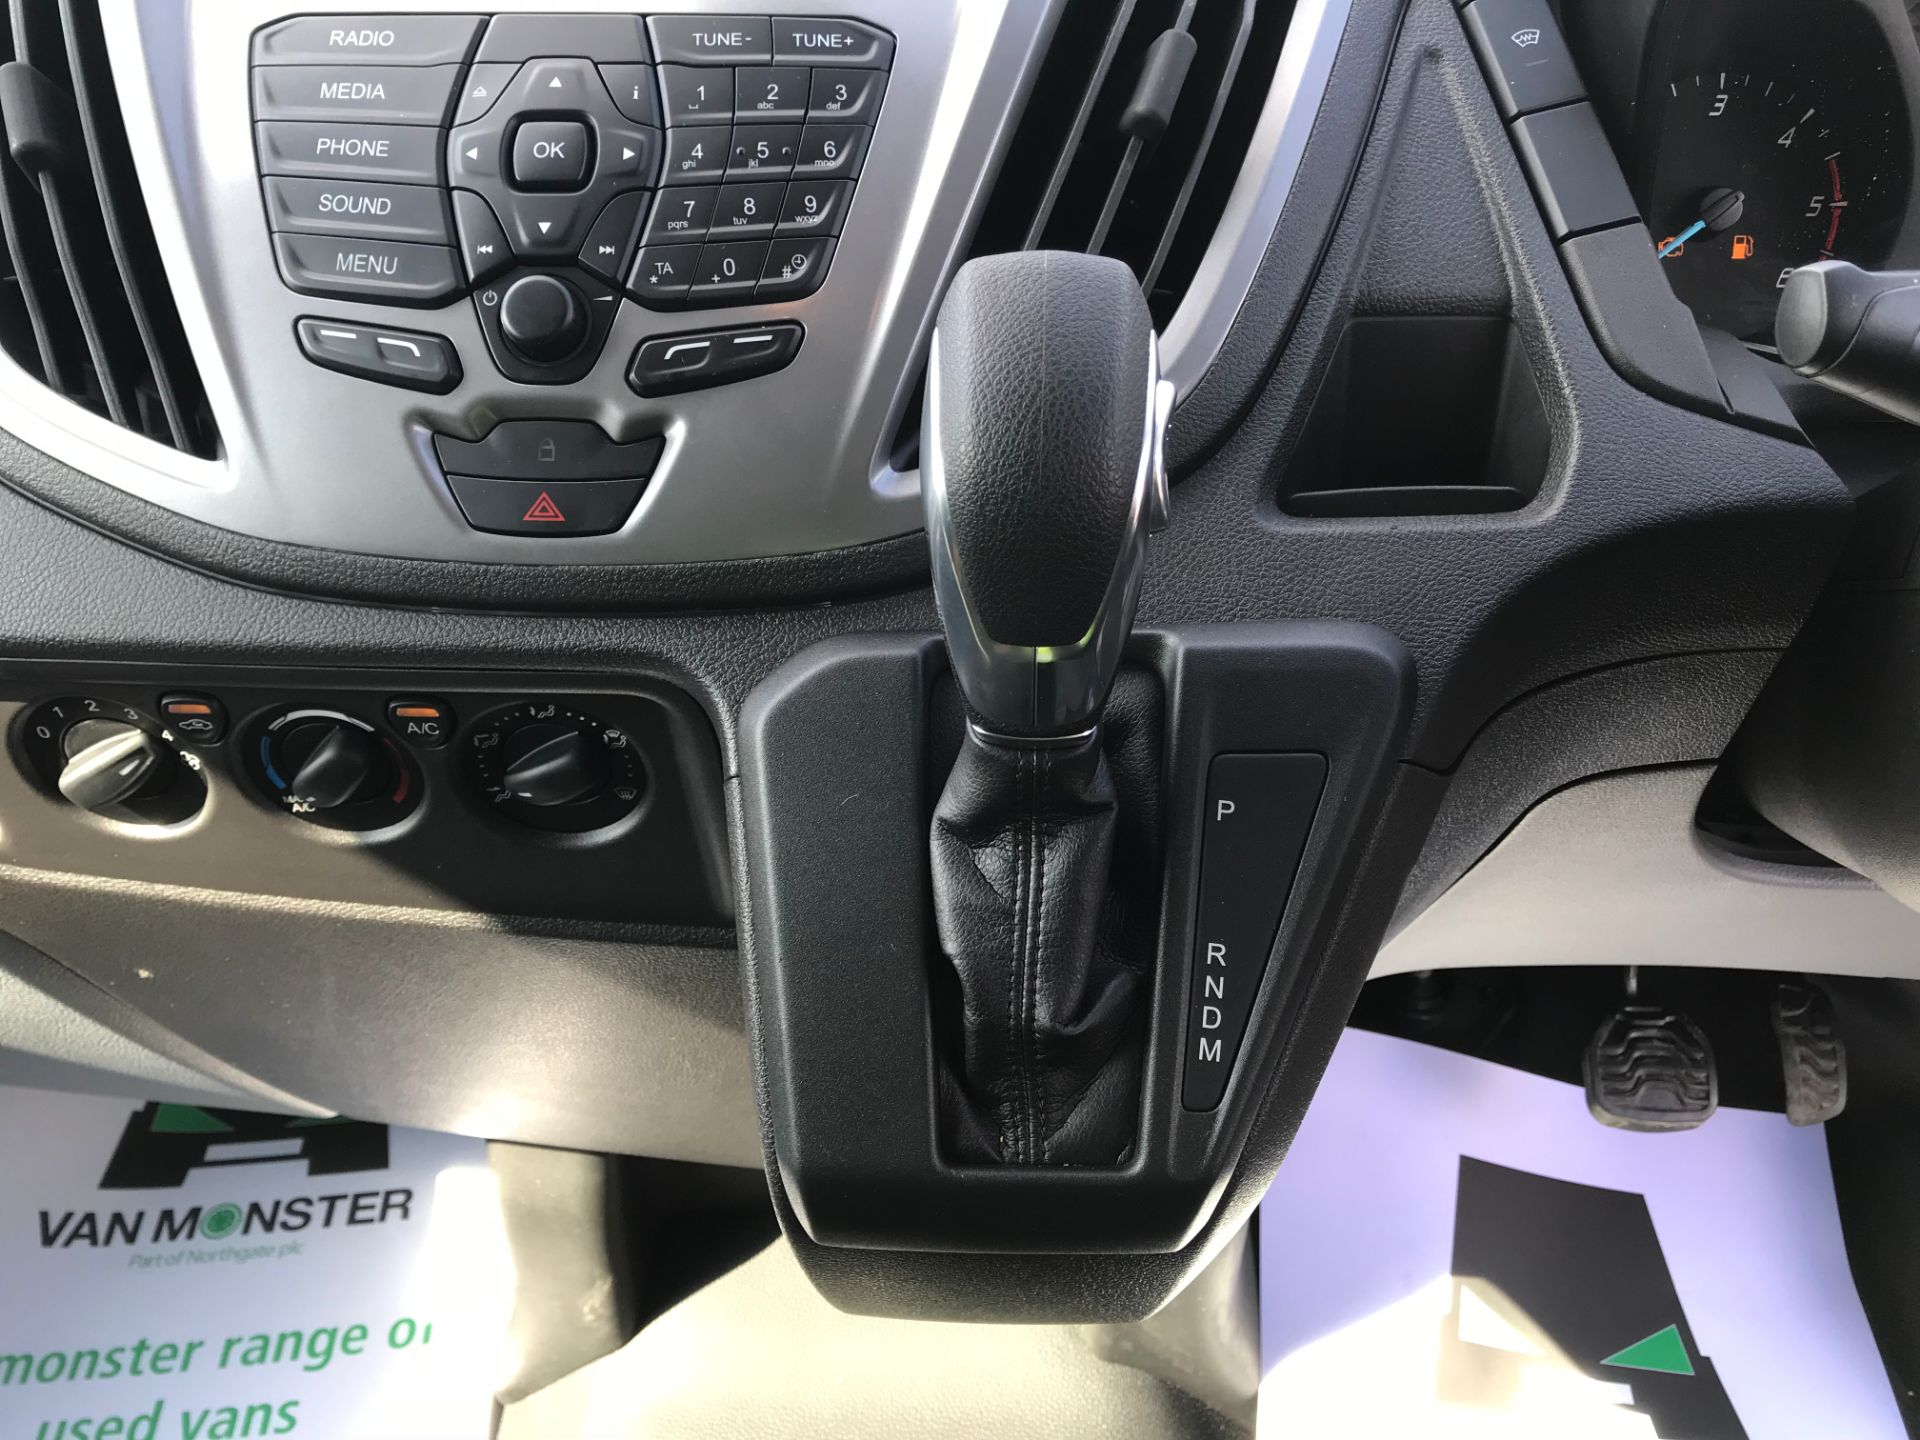 2018 Ford Transit 2.0 TDCi 130ps H2 D/Cab Trend Van Auto (WP68WHL) Image 5